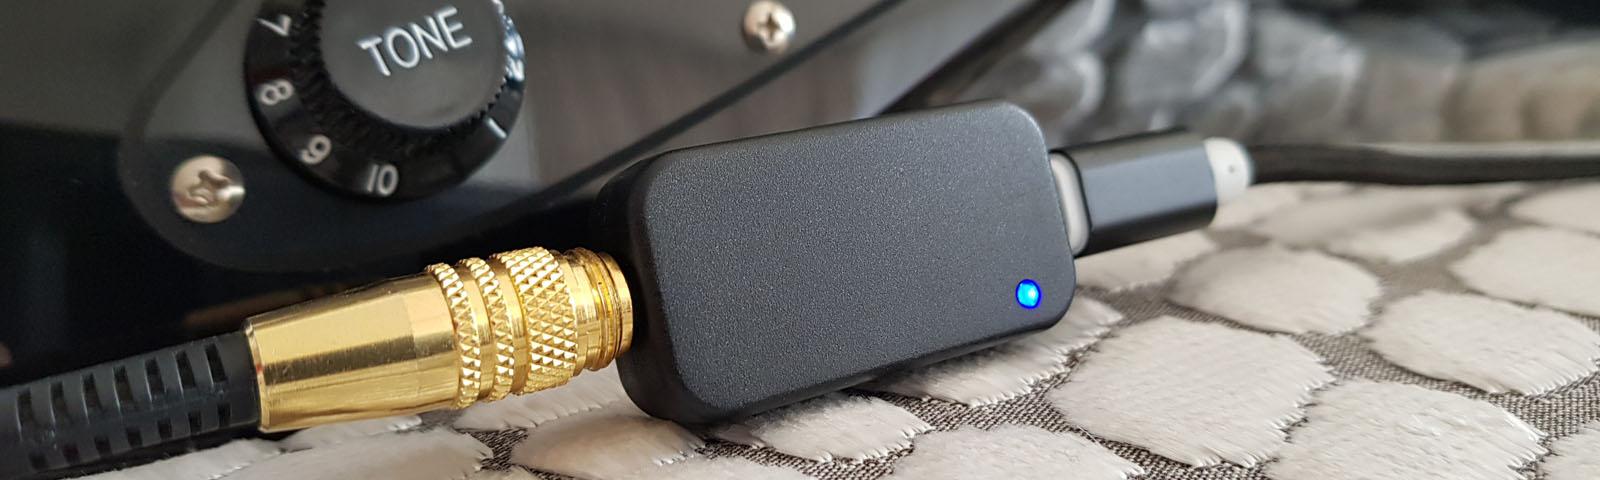 arteluxa USB Type-C DAC PCM5122A